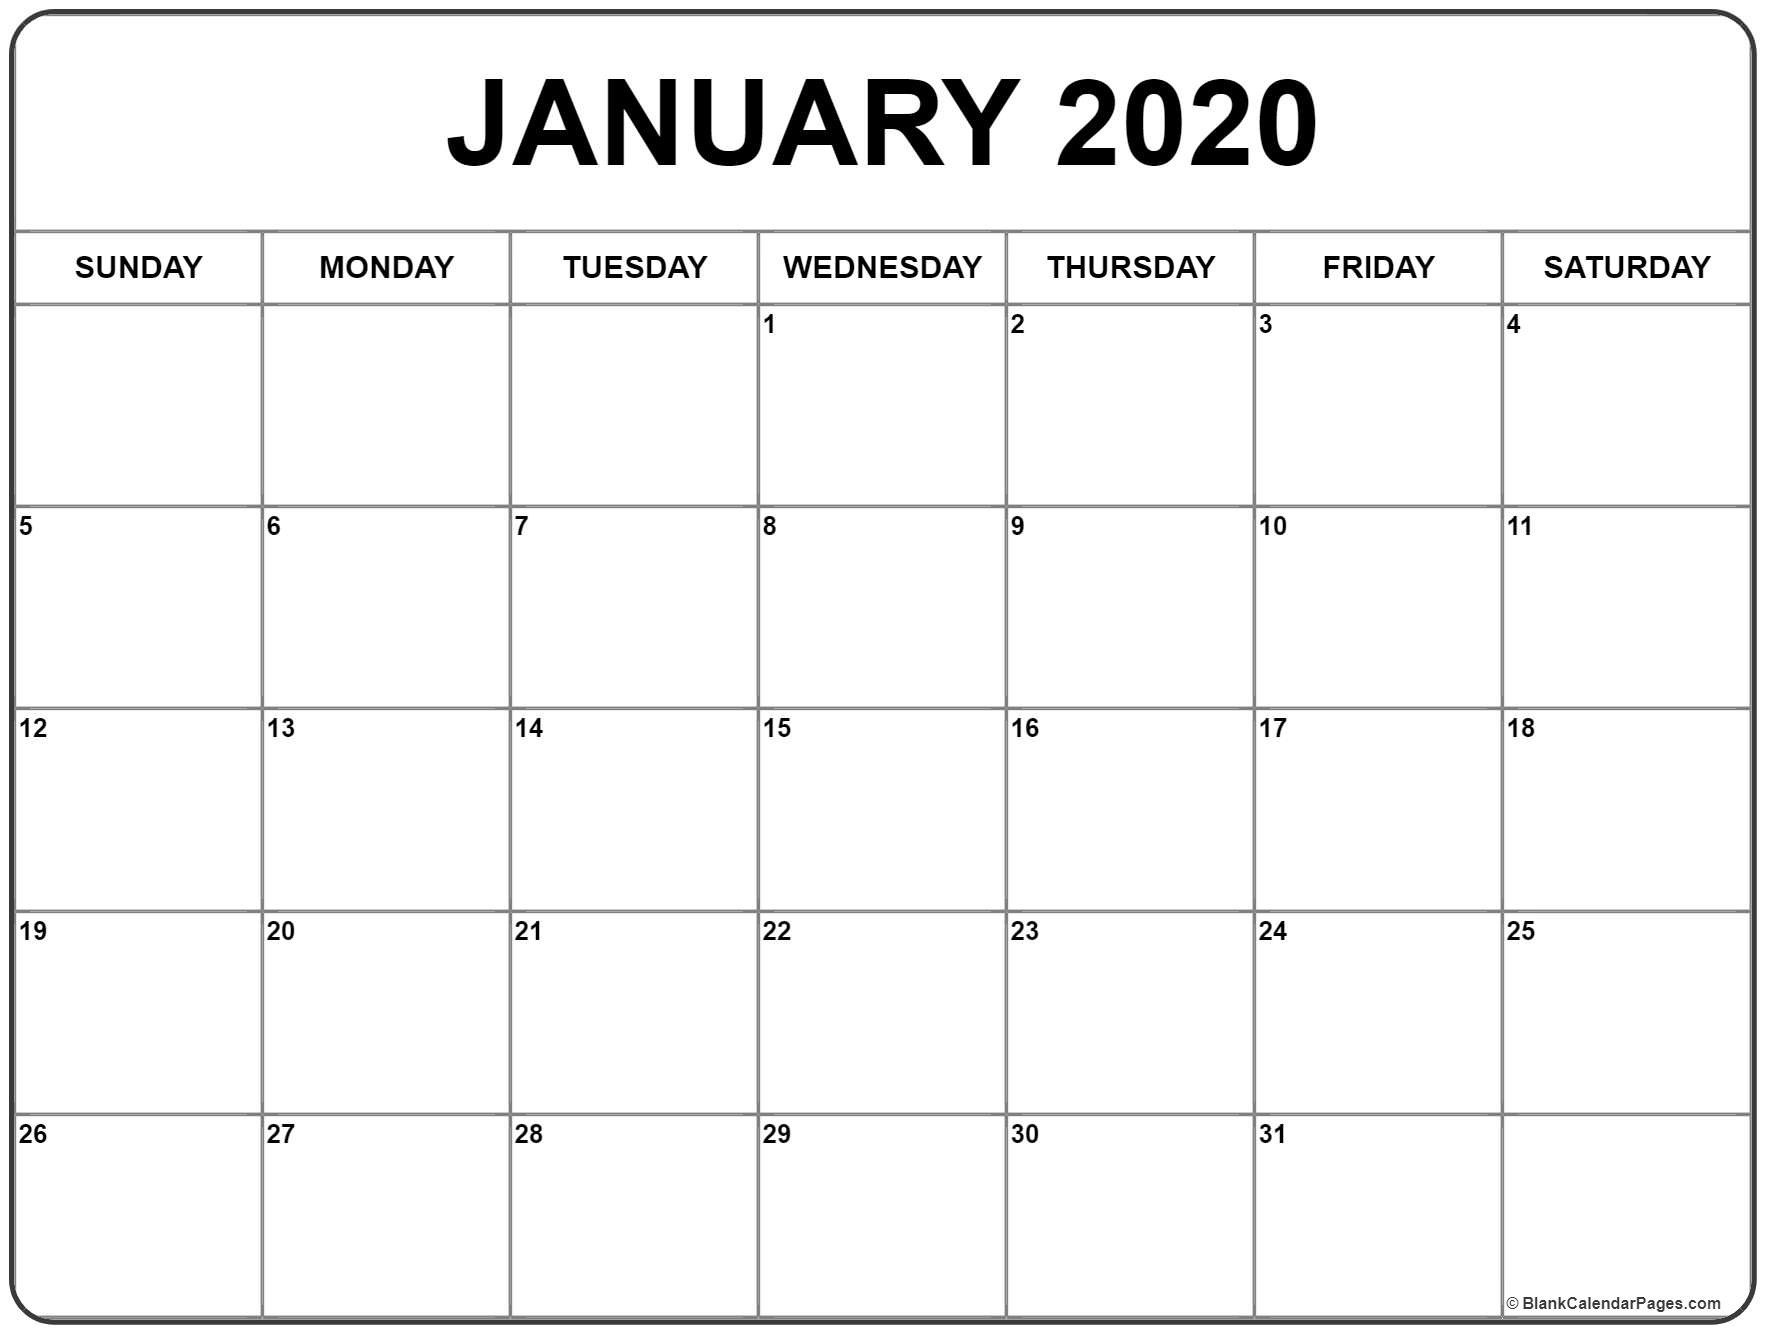 Free Calendar 2020 Printable January 2020 Calendar Monthly Yearly